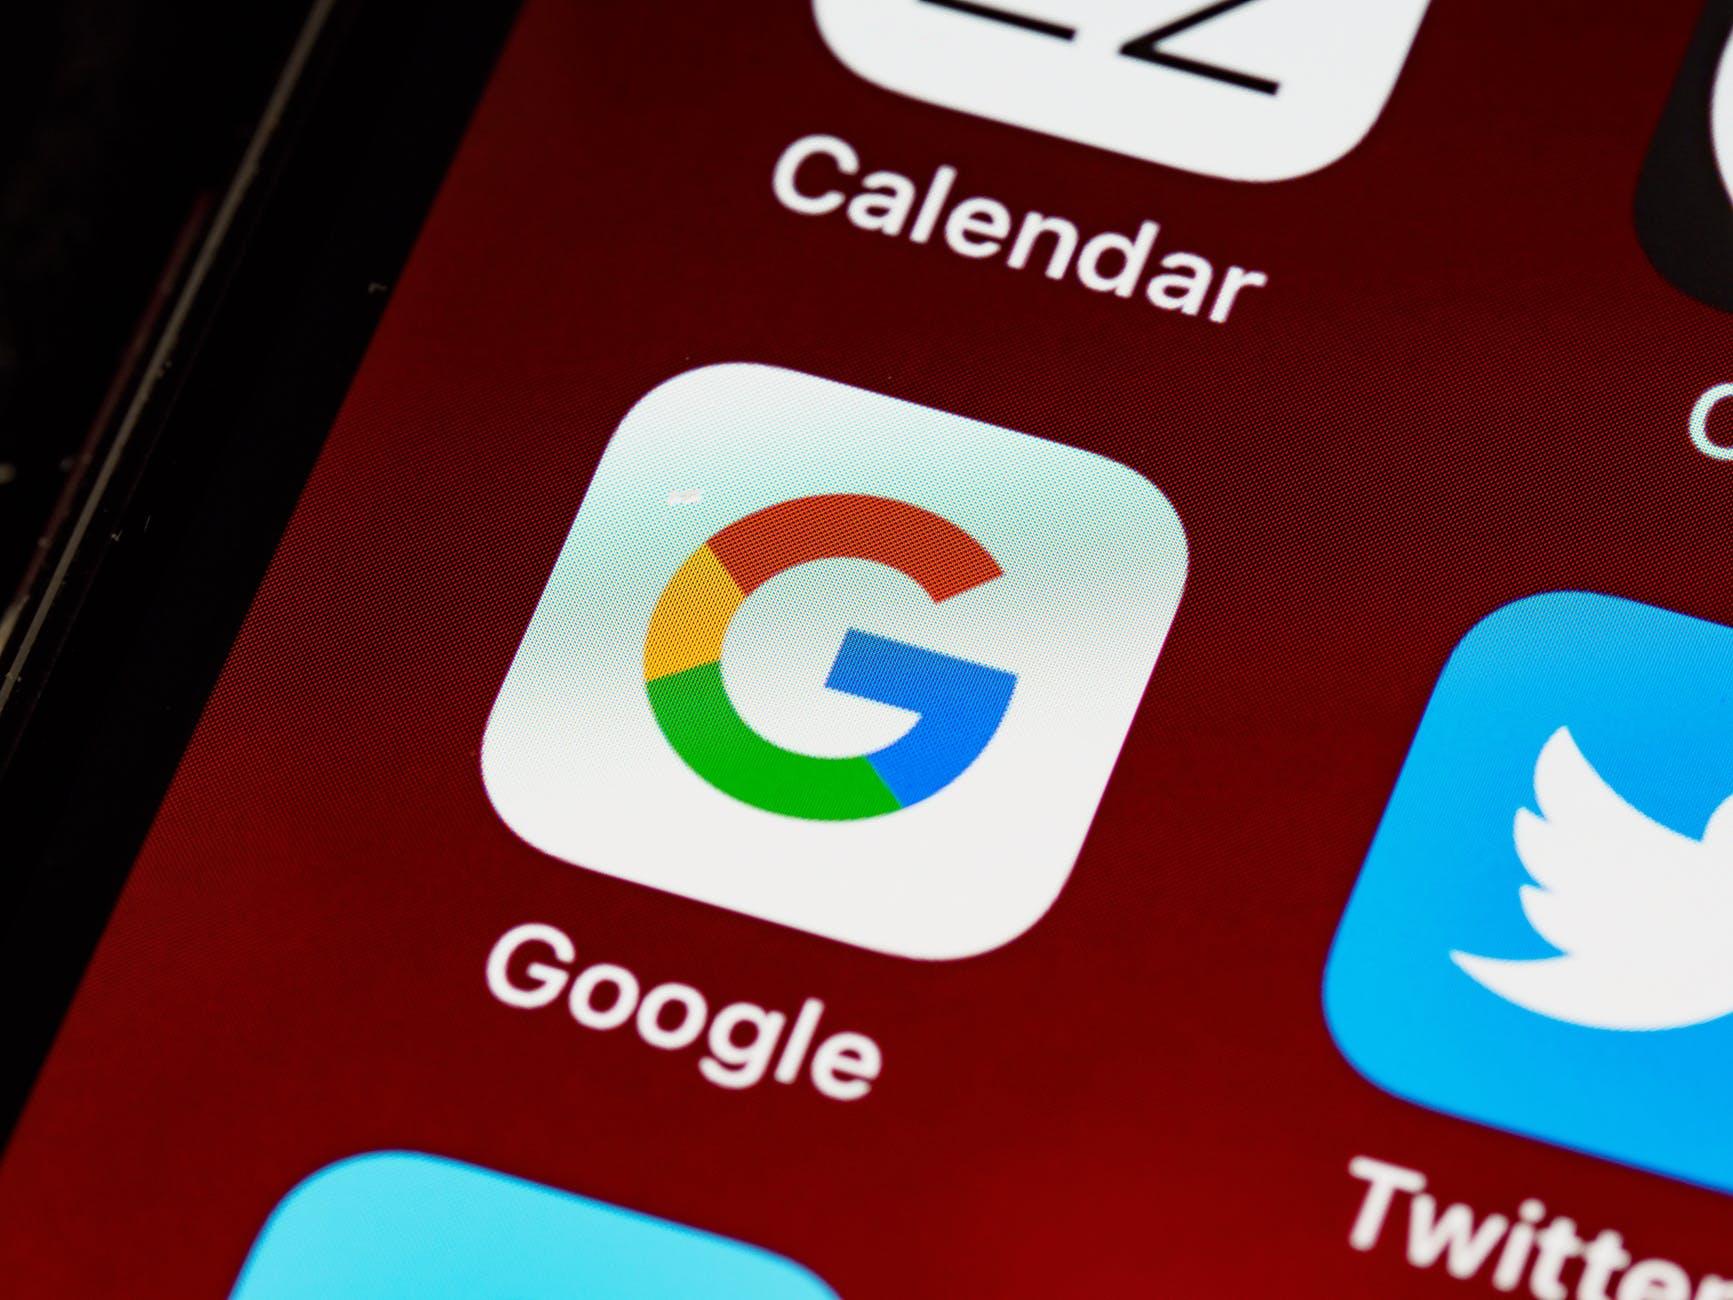 Image Google pexels